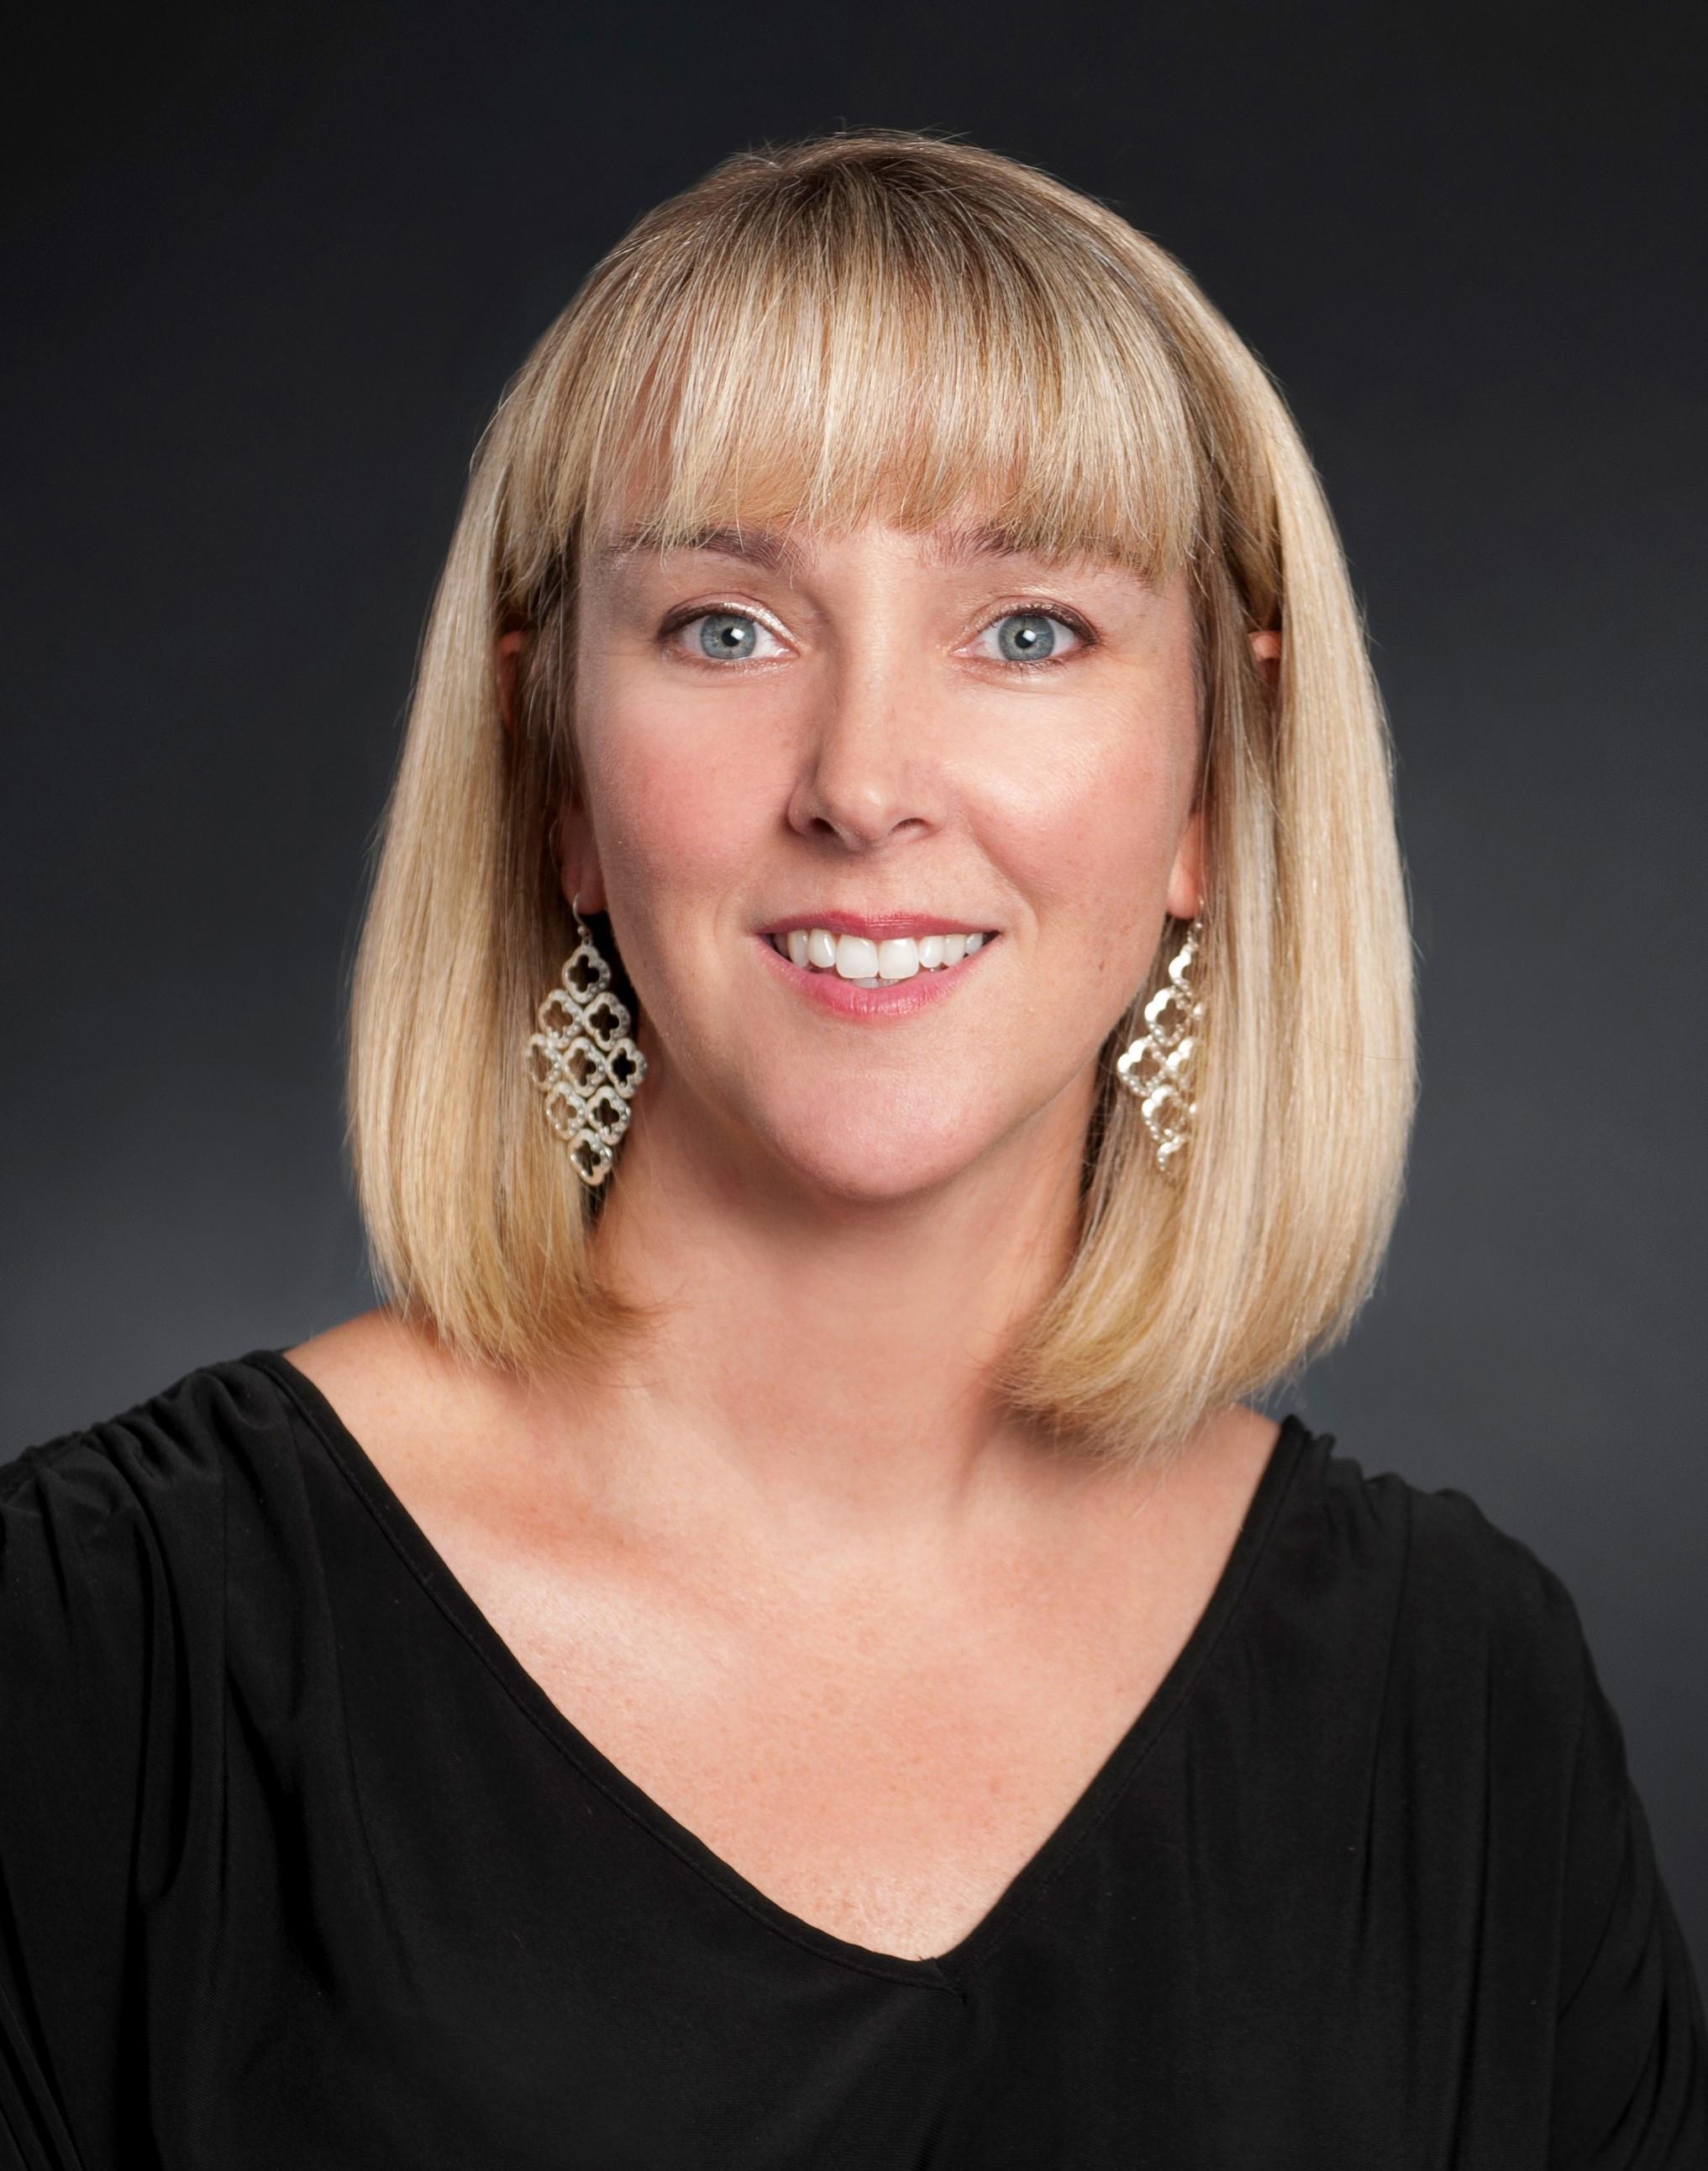 Jennifer Garrabrant